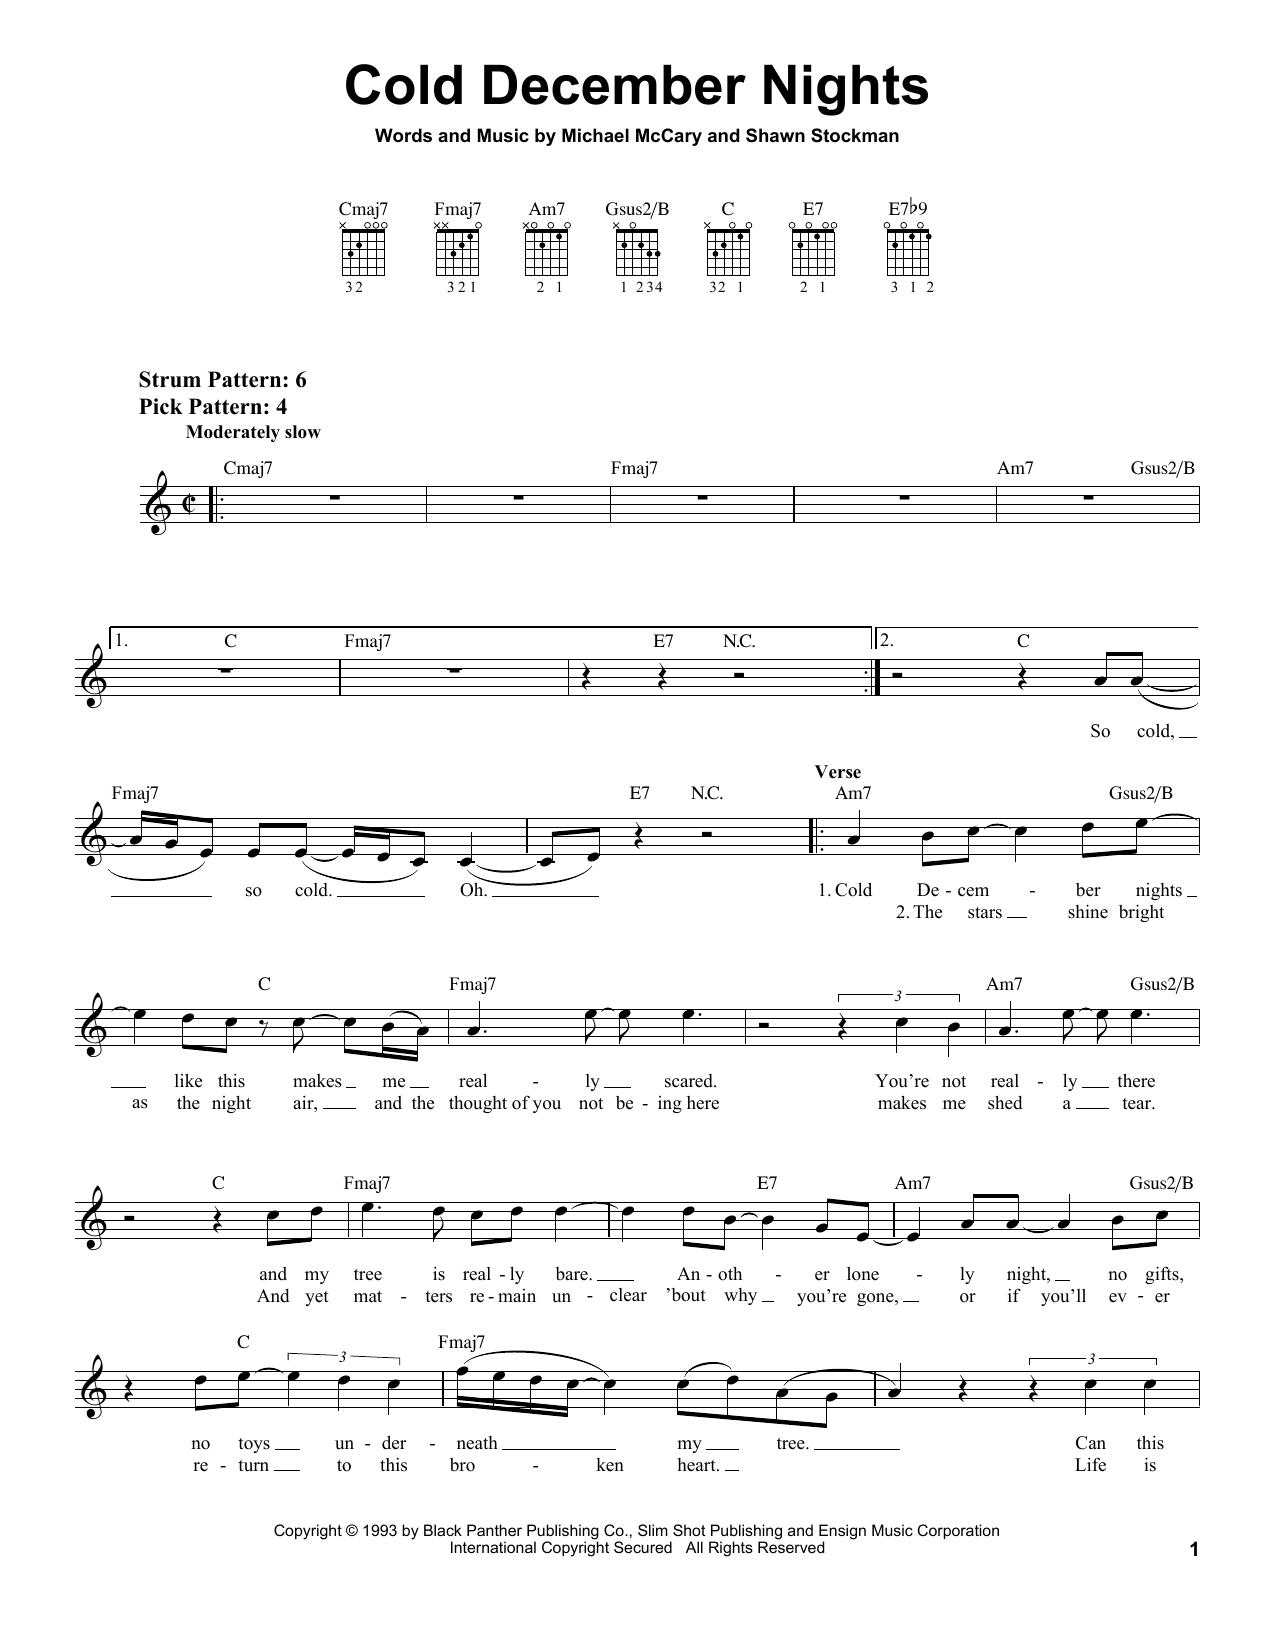 Boyz II Men Cold December Nights sheet music notes and chords. Download Printable PDF.